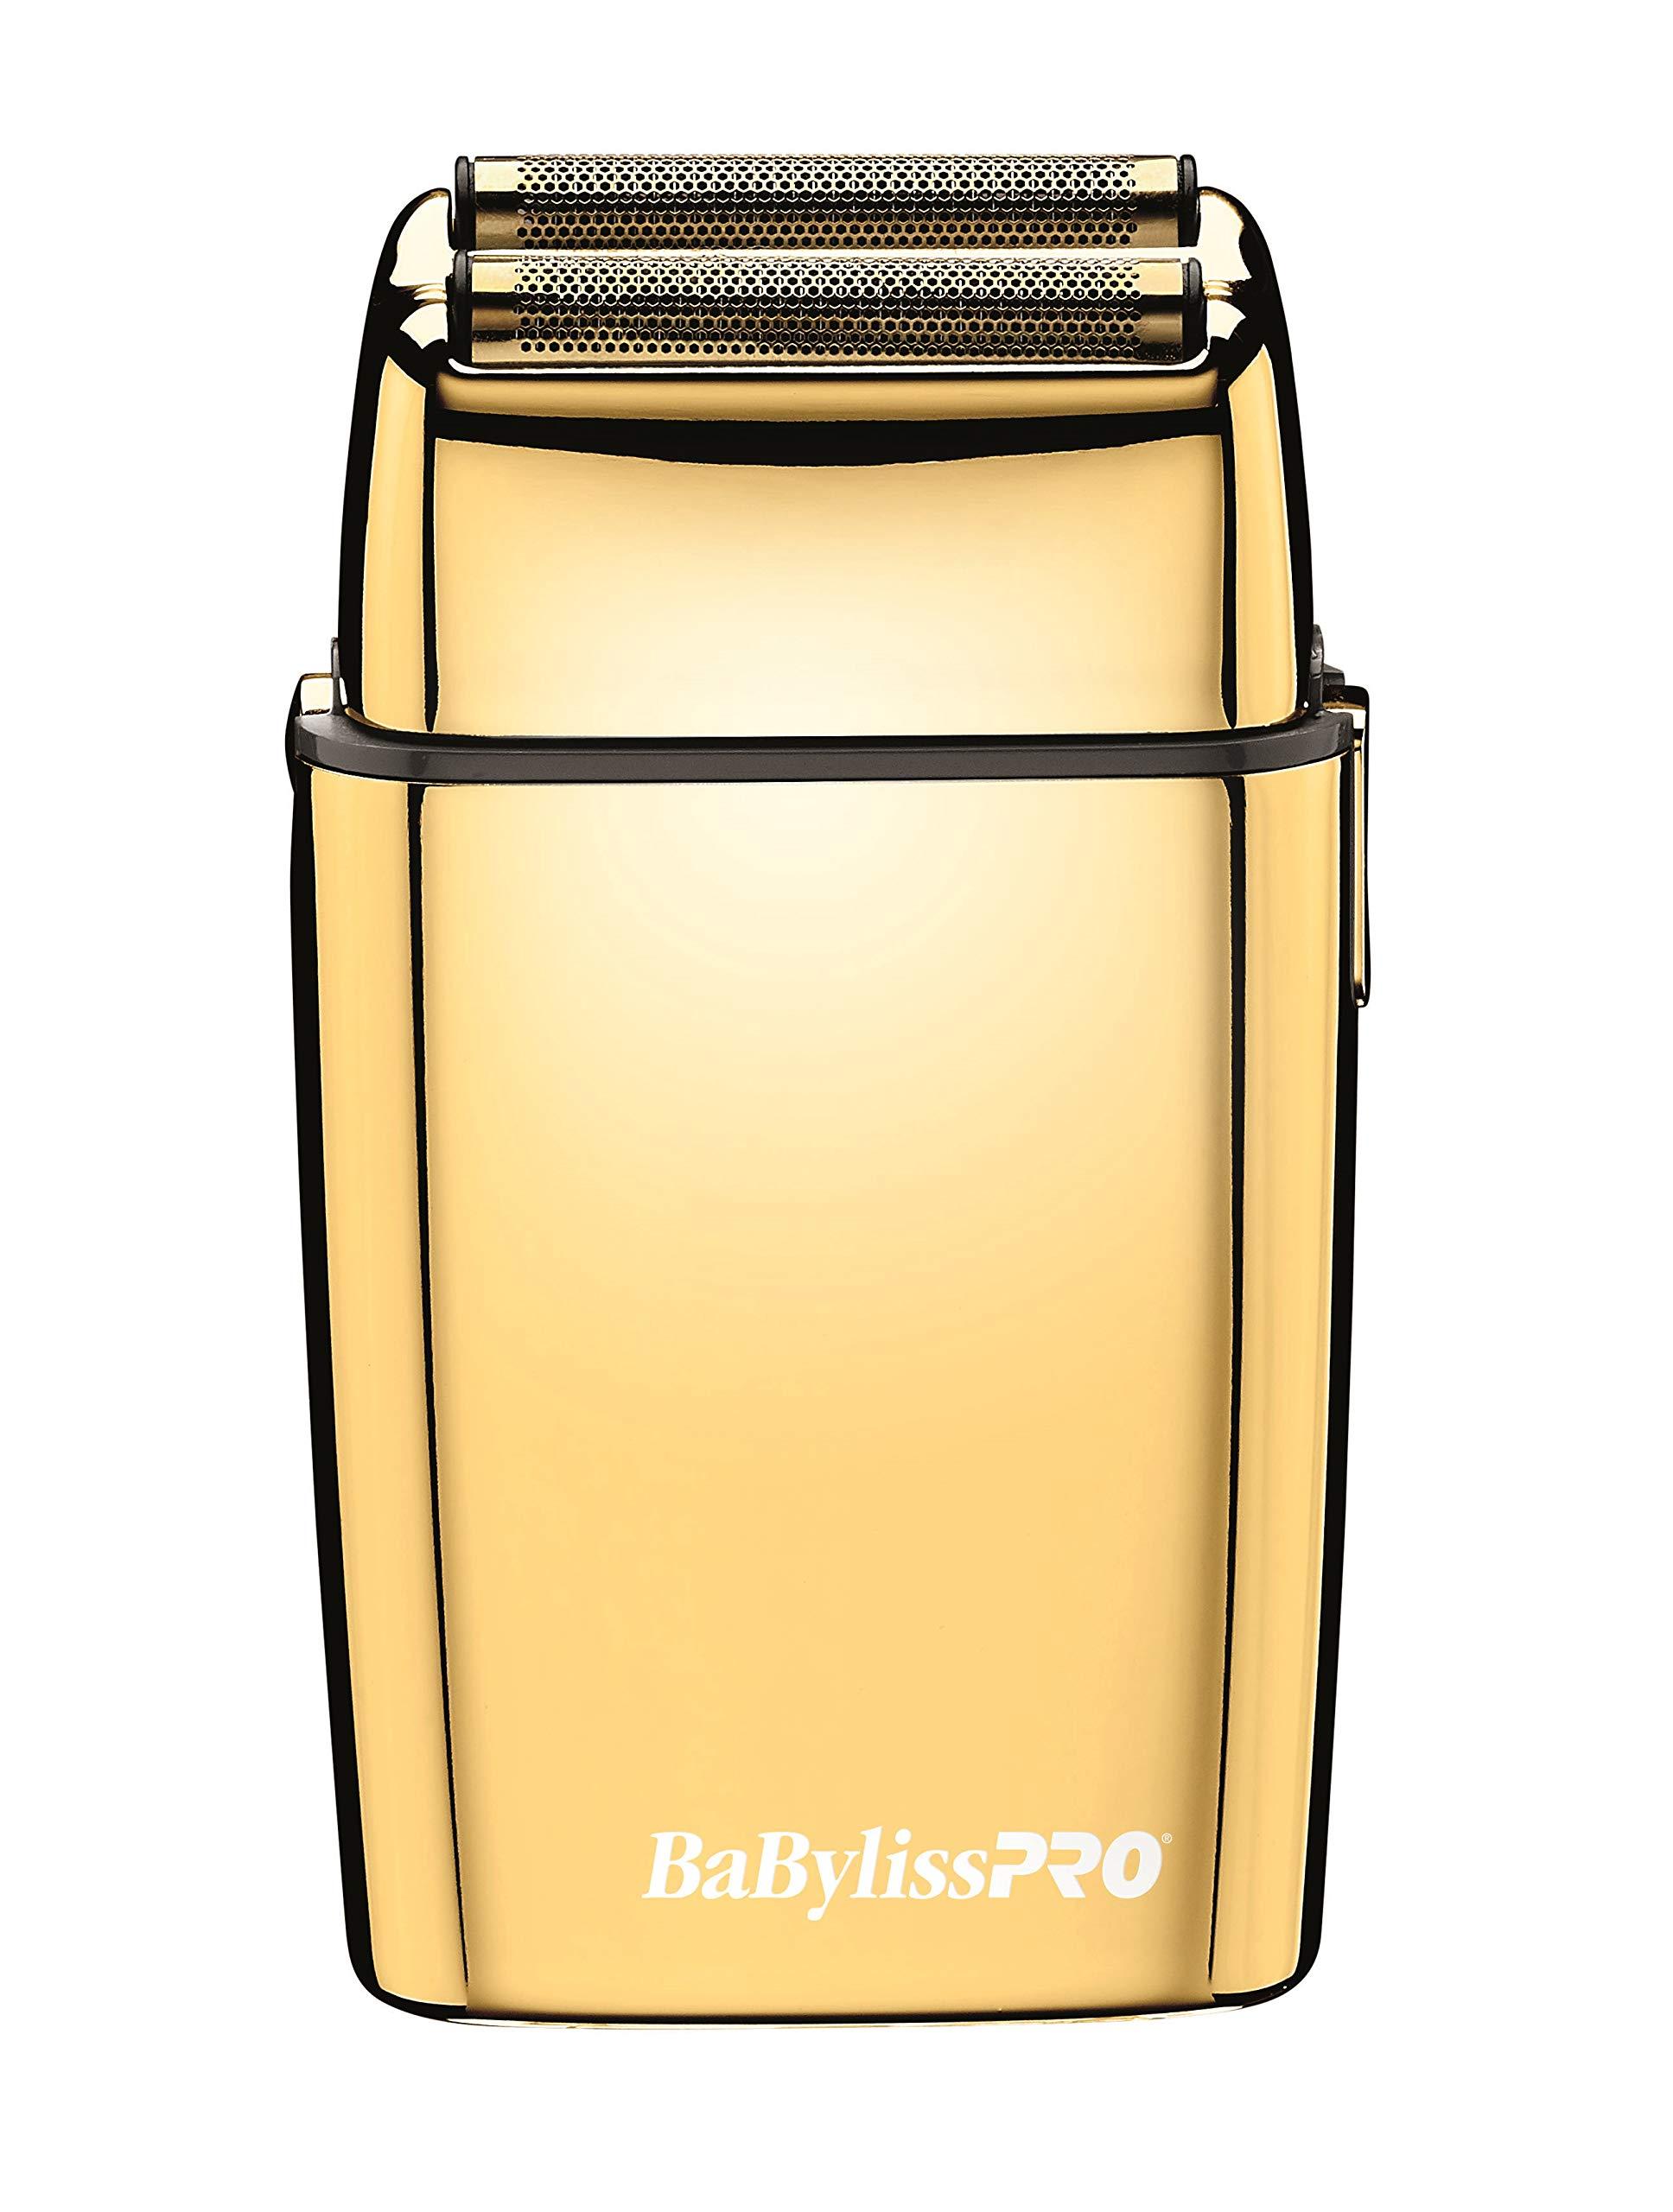 BaBylissPRO Foilfx02 Cordless Metal Gold Foil - 81fqnw0OghL - BaBylissPRO Double Foil Cordless Shaver, Metal